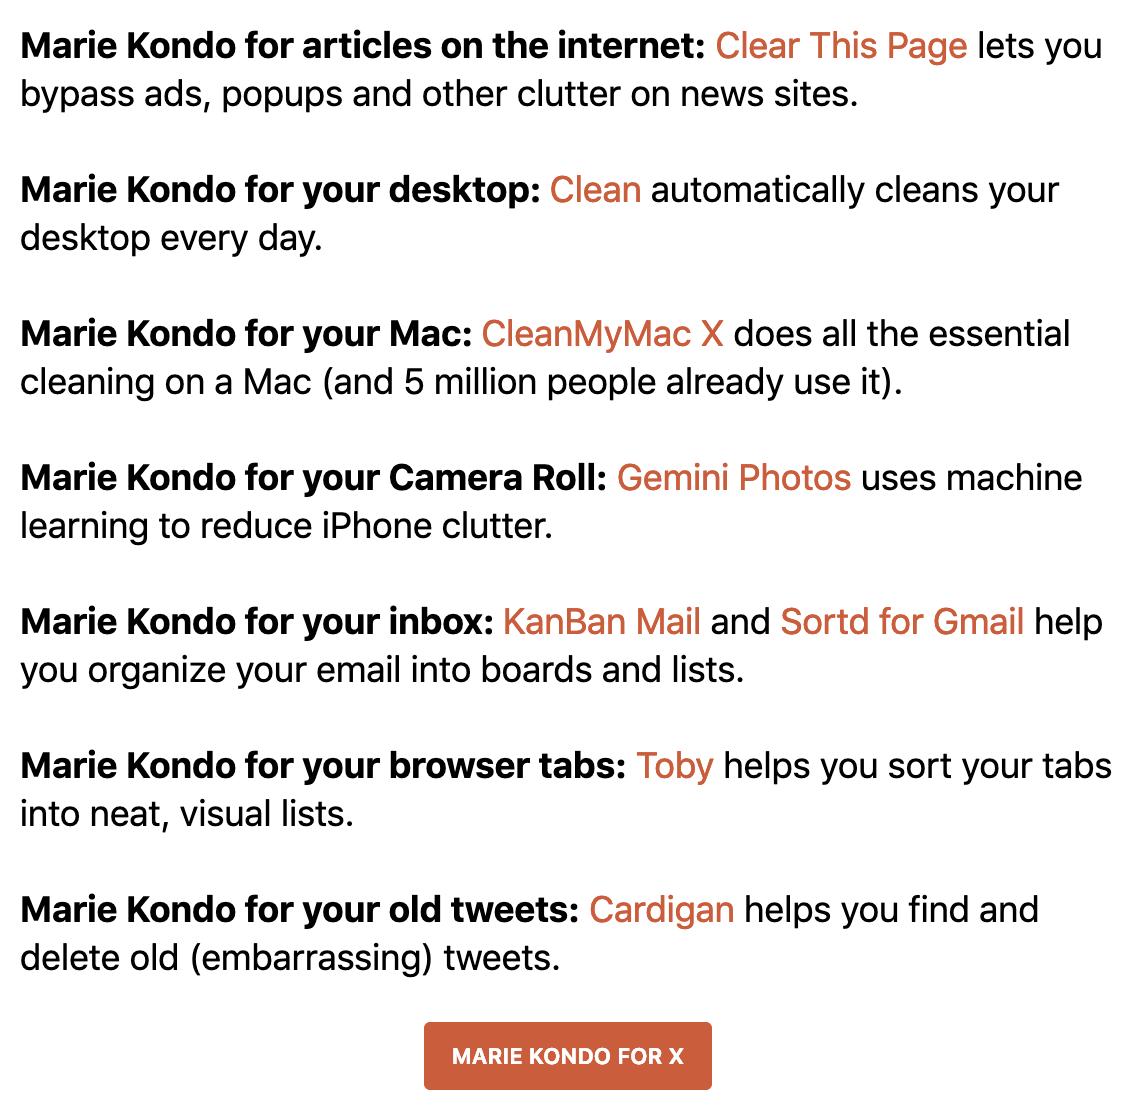 Marie Kondo for X